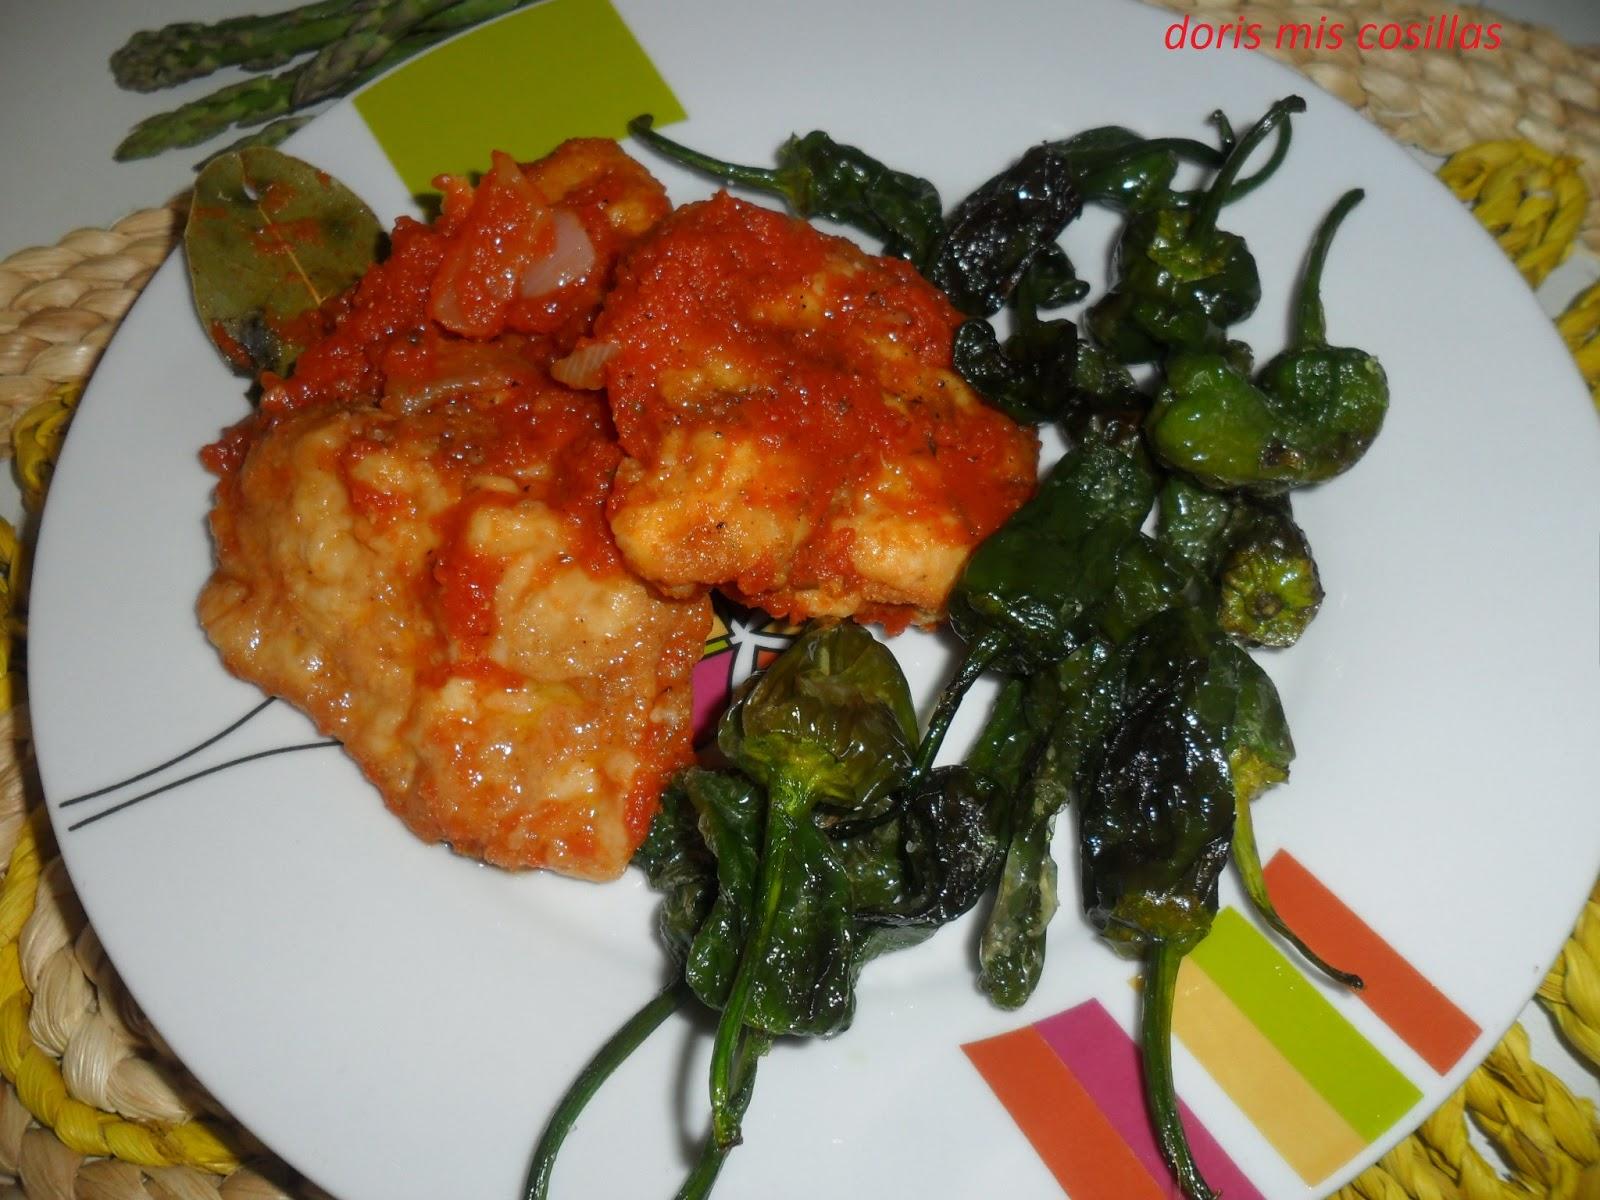 Doris mis cosillas bacalao fresco con tomate esp rragos - Bacalao fresco con tomate ...